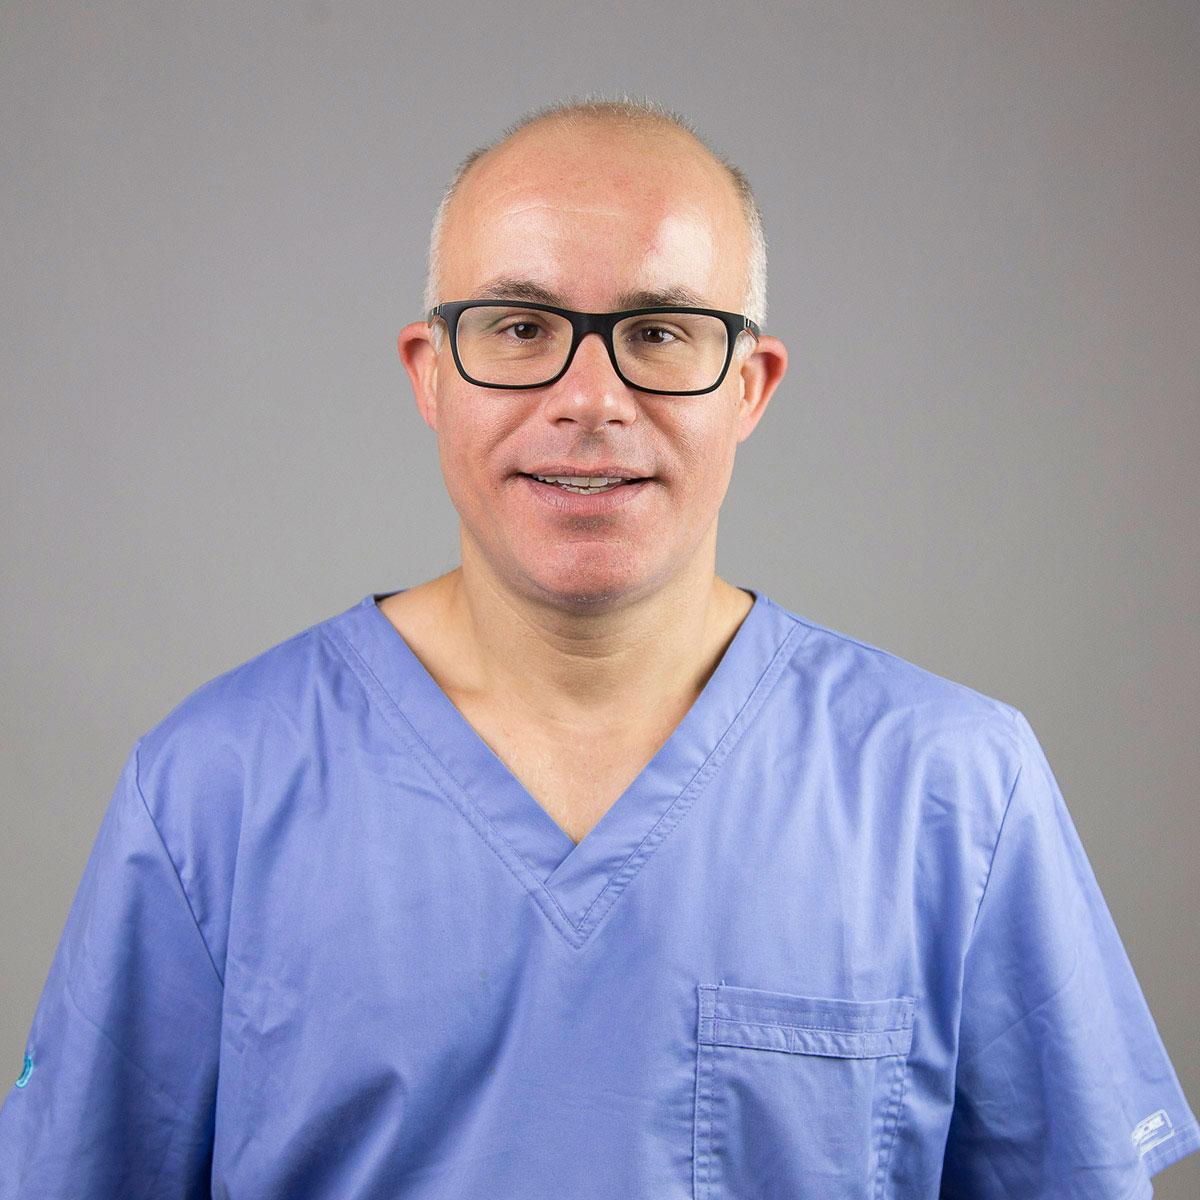 EDUARD SERRANO - Cirurgià maxillofacial - Implantòleg